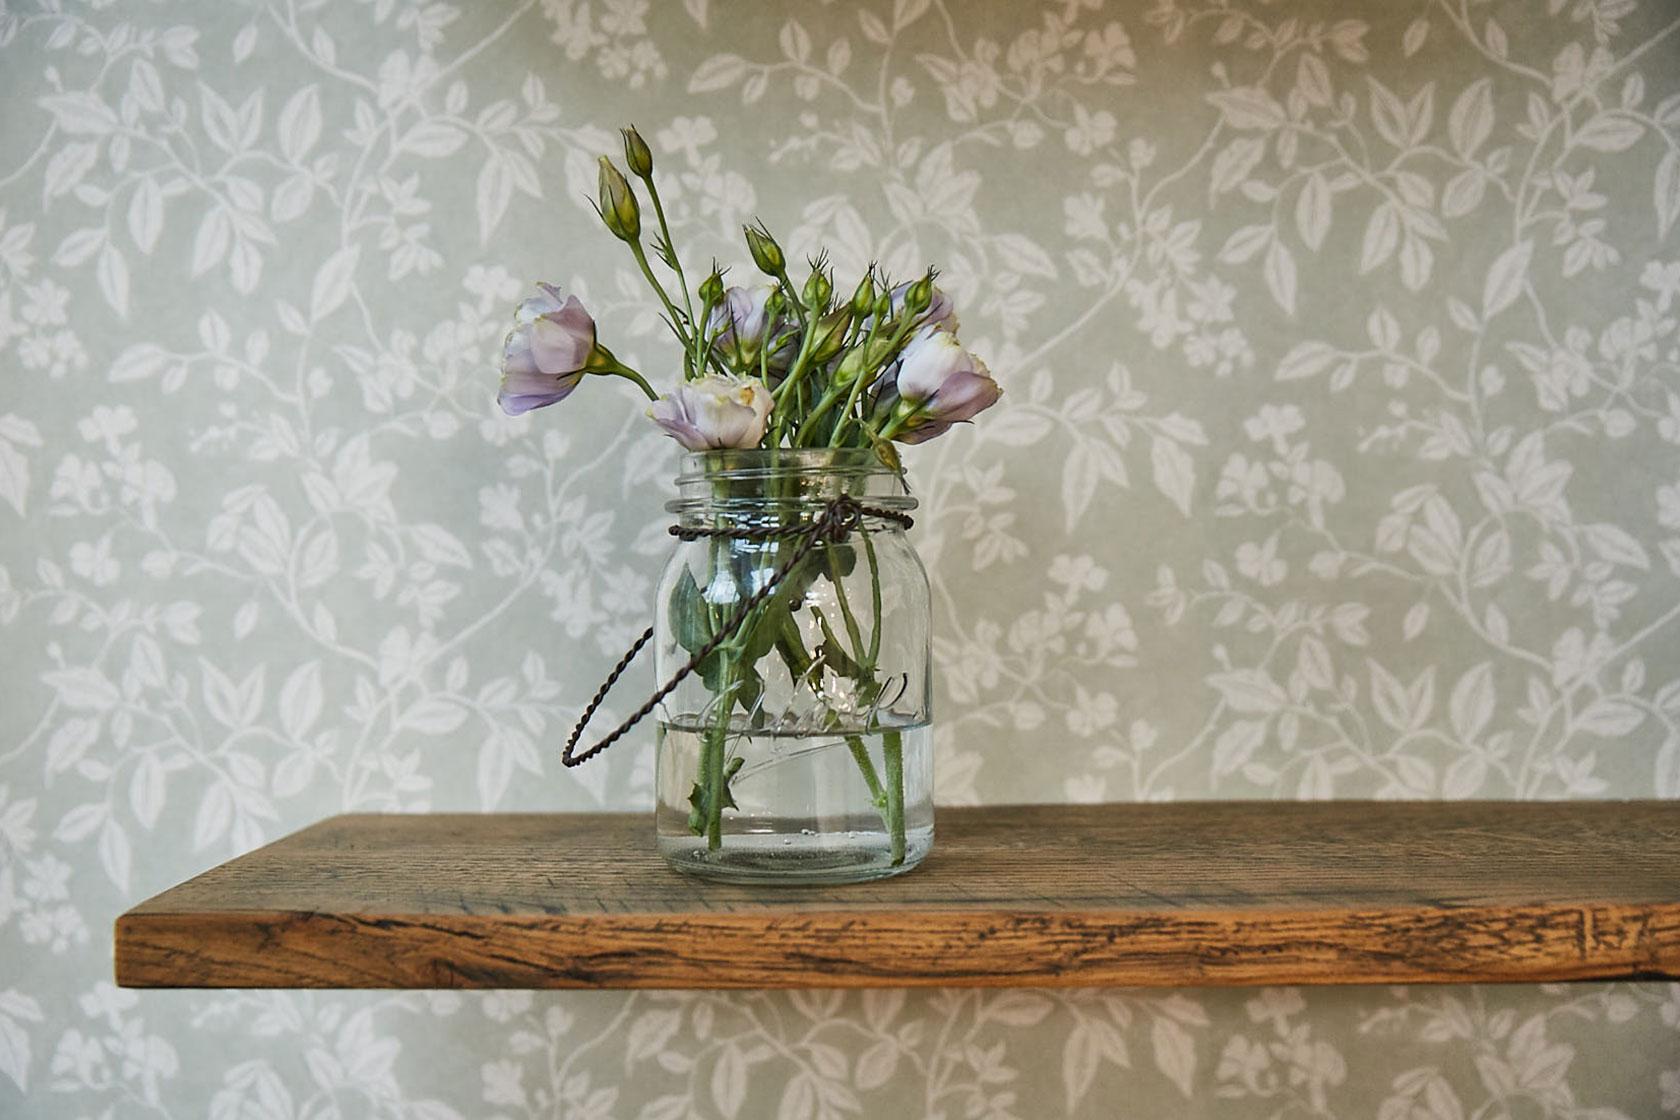 Flowers in glass jar sit on rustic oak shelf with green floral wallpaper background